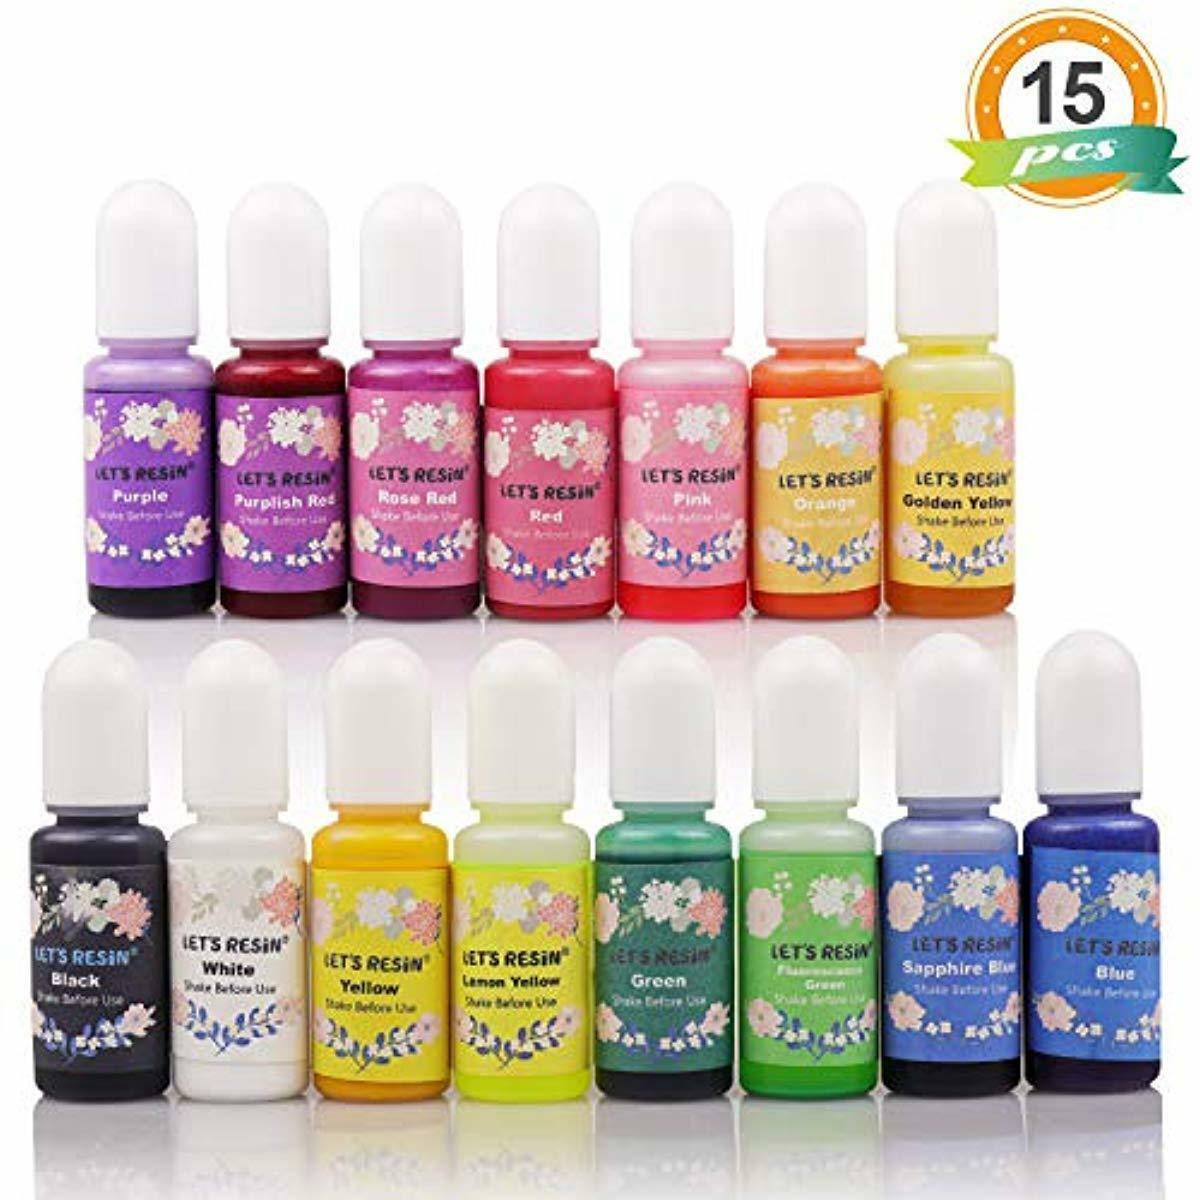 LET'S RESIN 15 Colors Epoxy Pigment, Translucent Liquid Resi